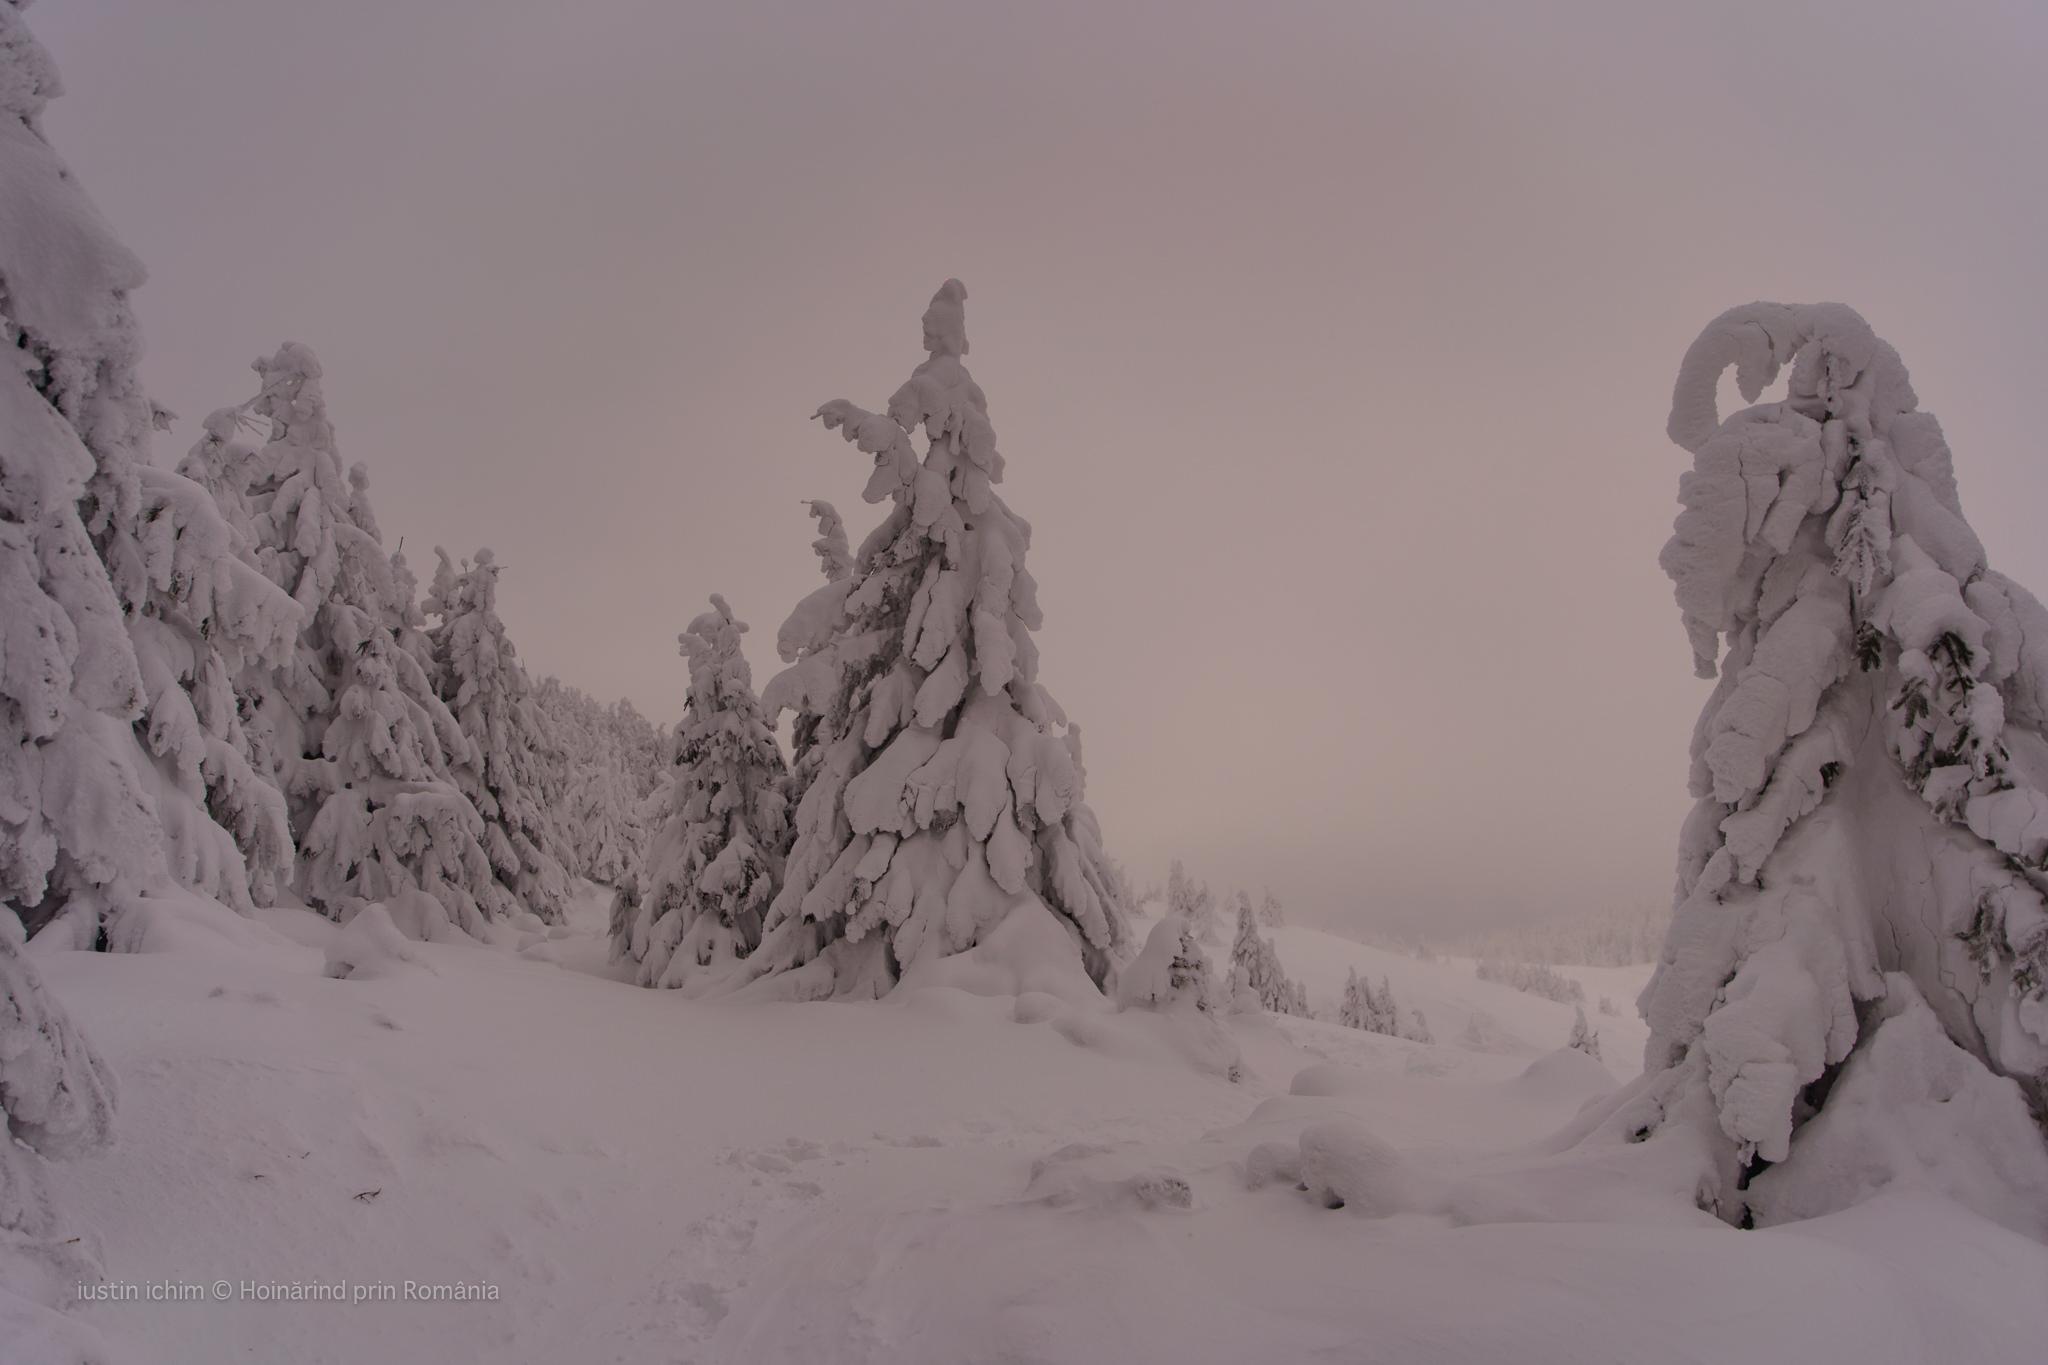 Peisaj de iarna in Muntii Hășmaș